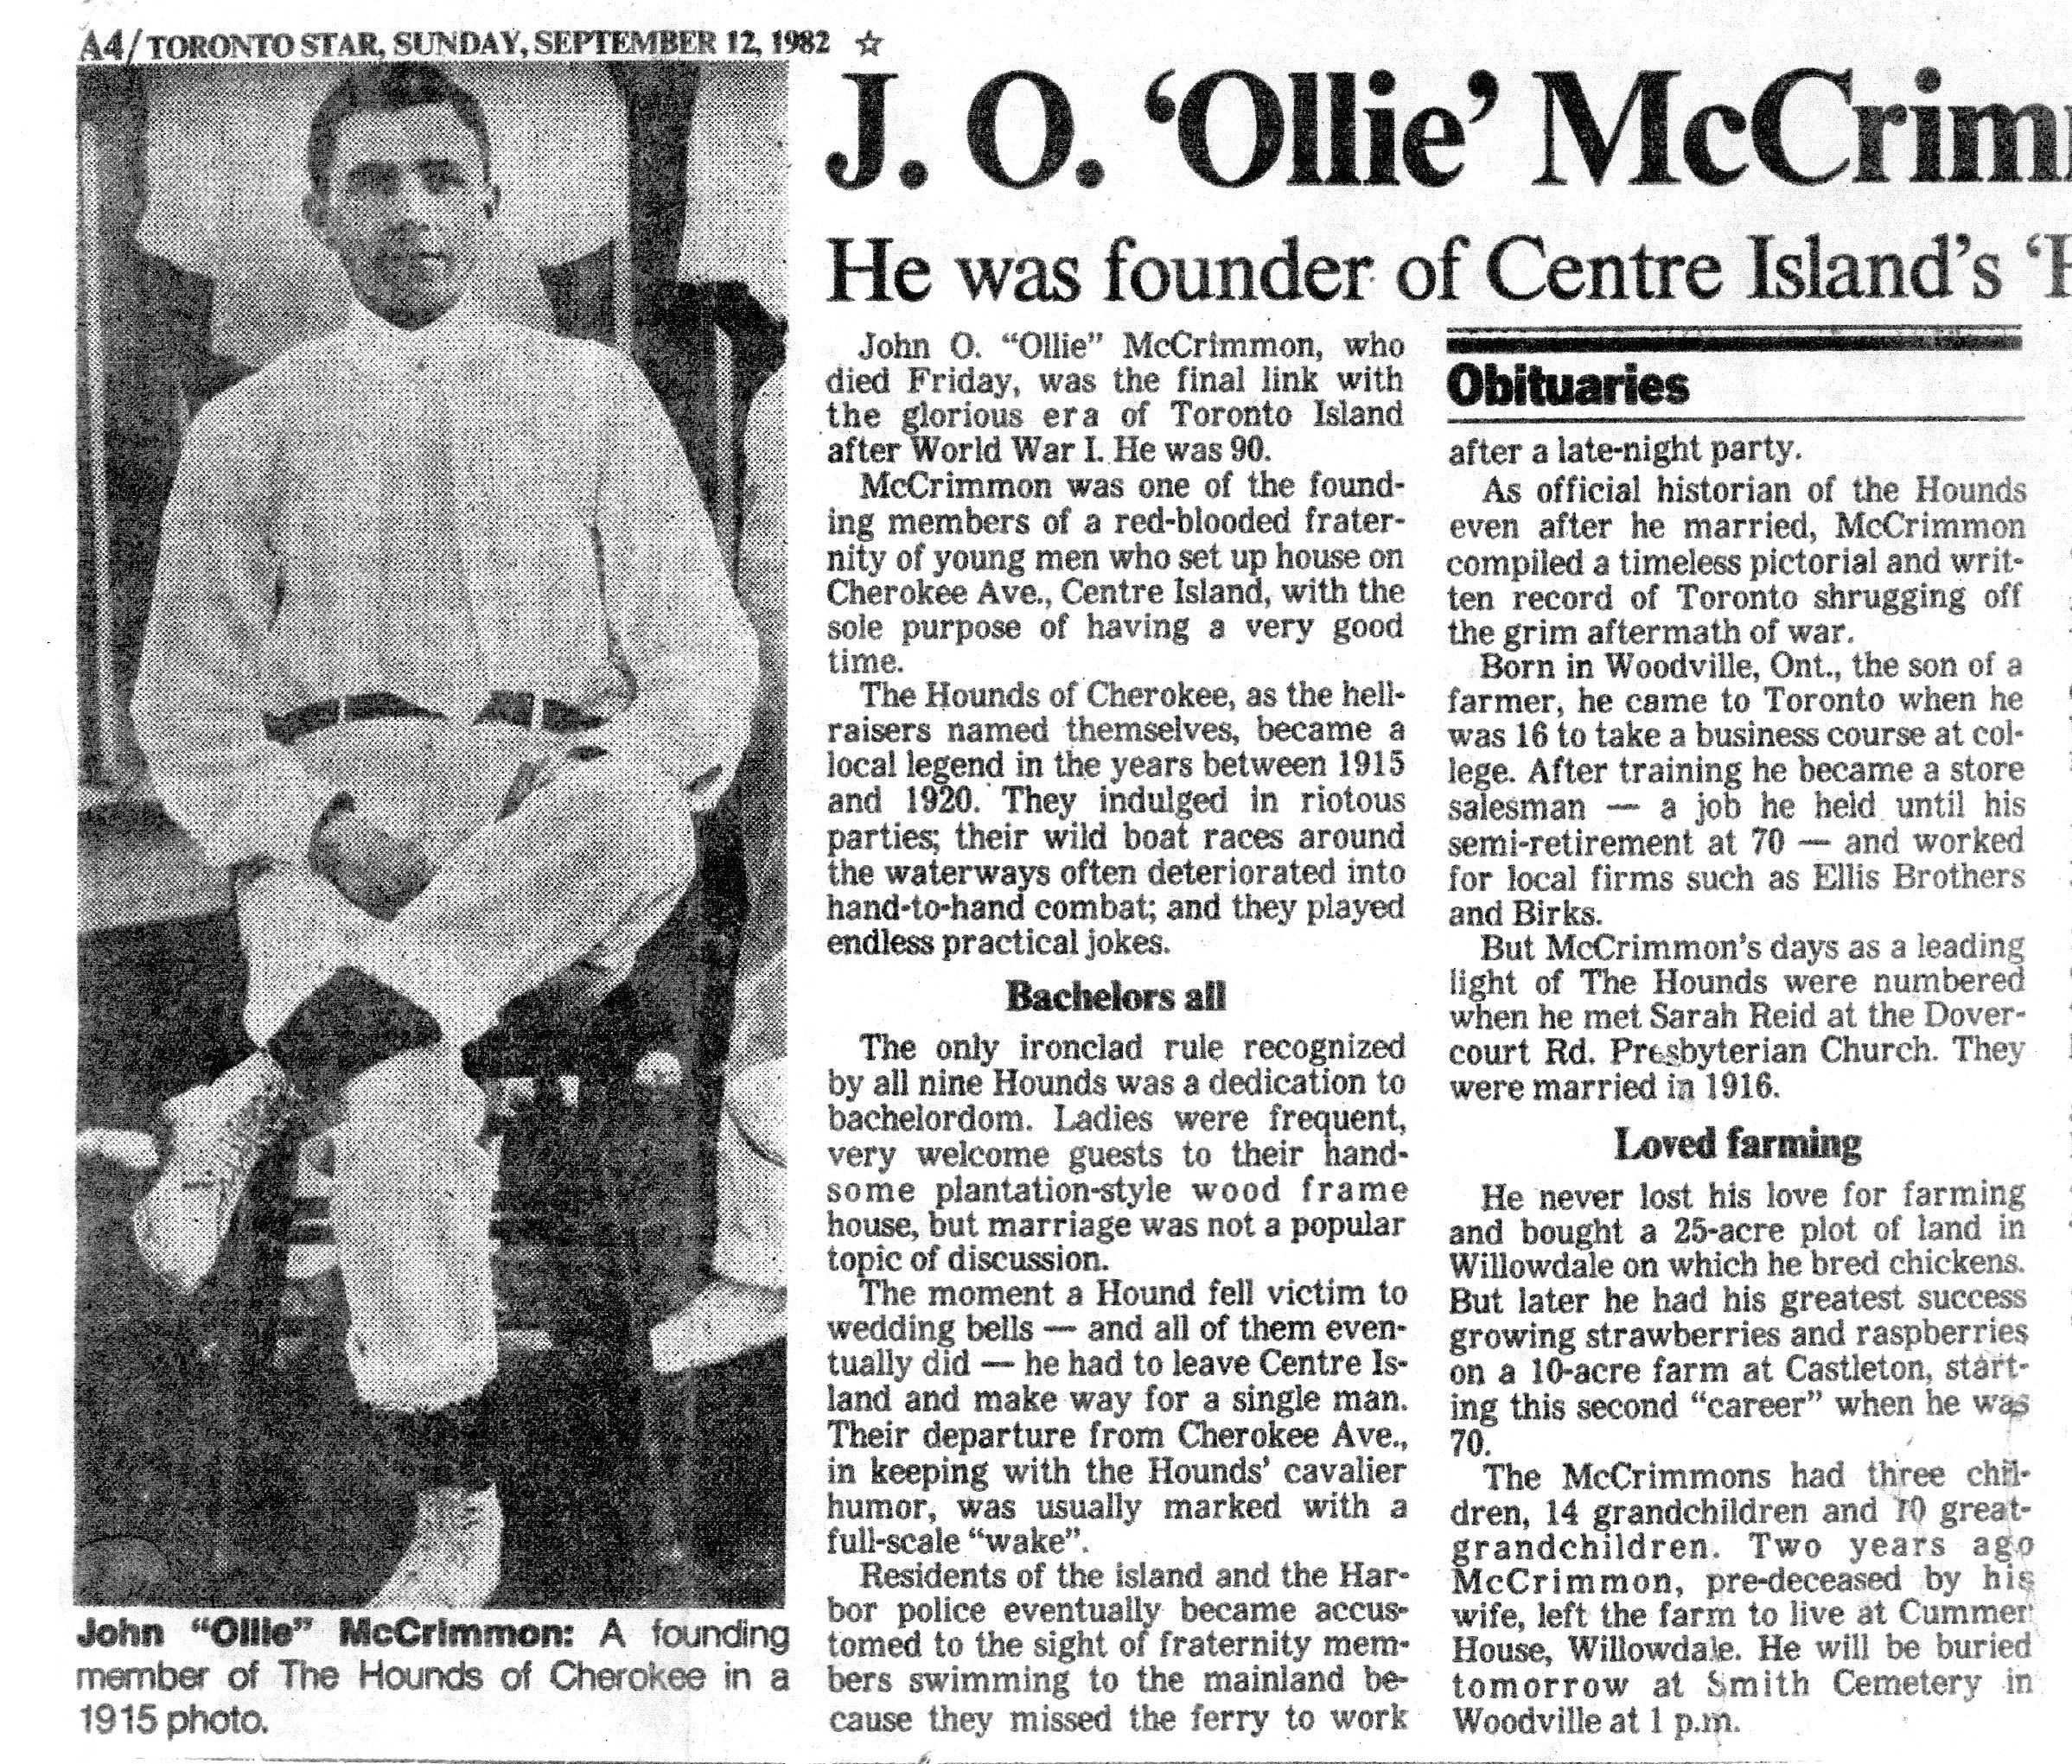 Obit-J.O. Ollie McCrimmon Toronto Star 1982-09-12